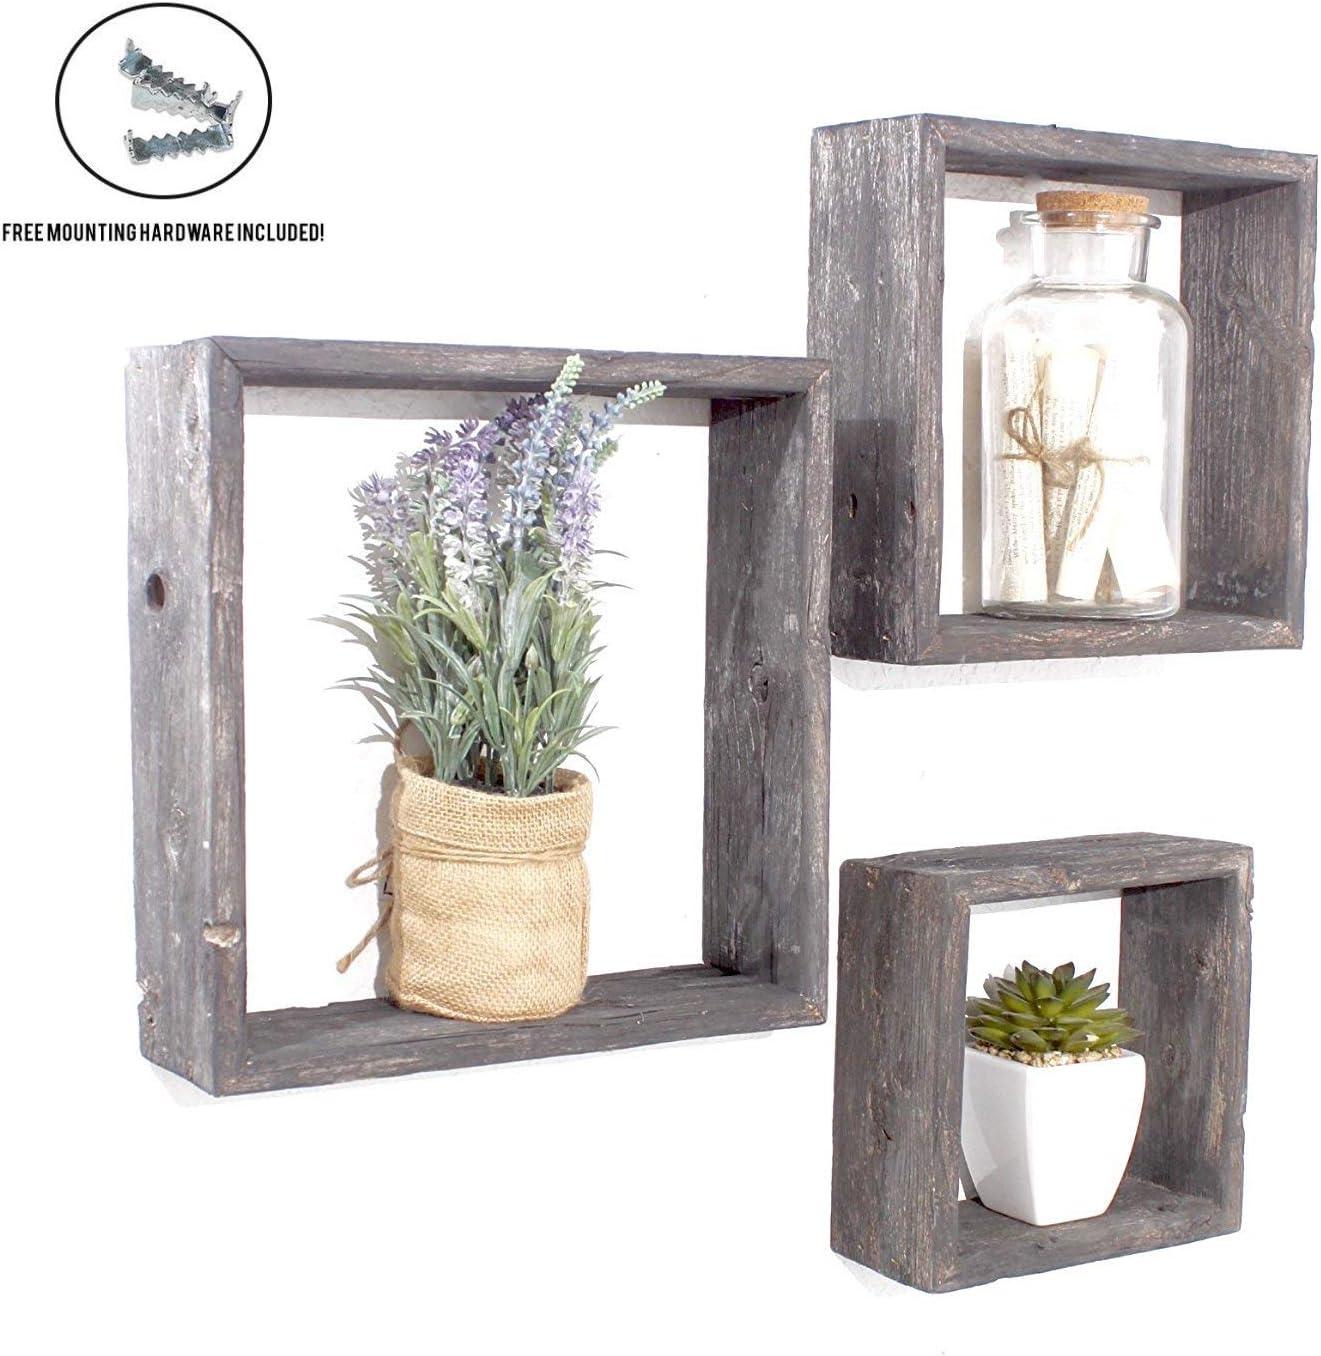 BarnwoodUSA Black Rustic Shelves, Square Floating Wood Shadowbox, Home Decor, Set of 3